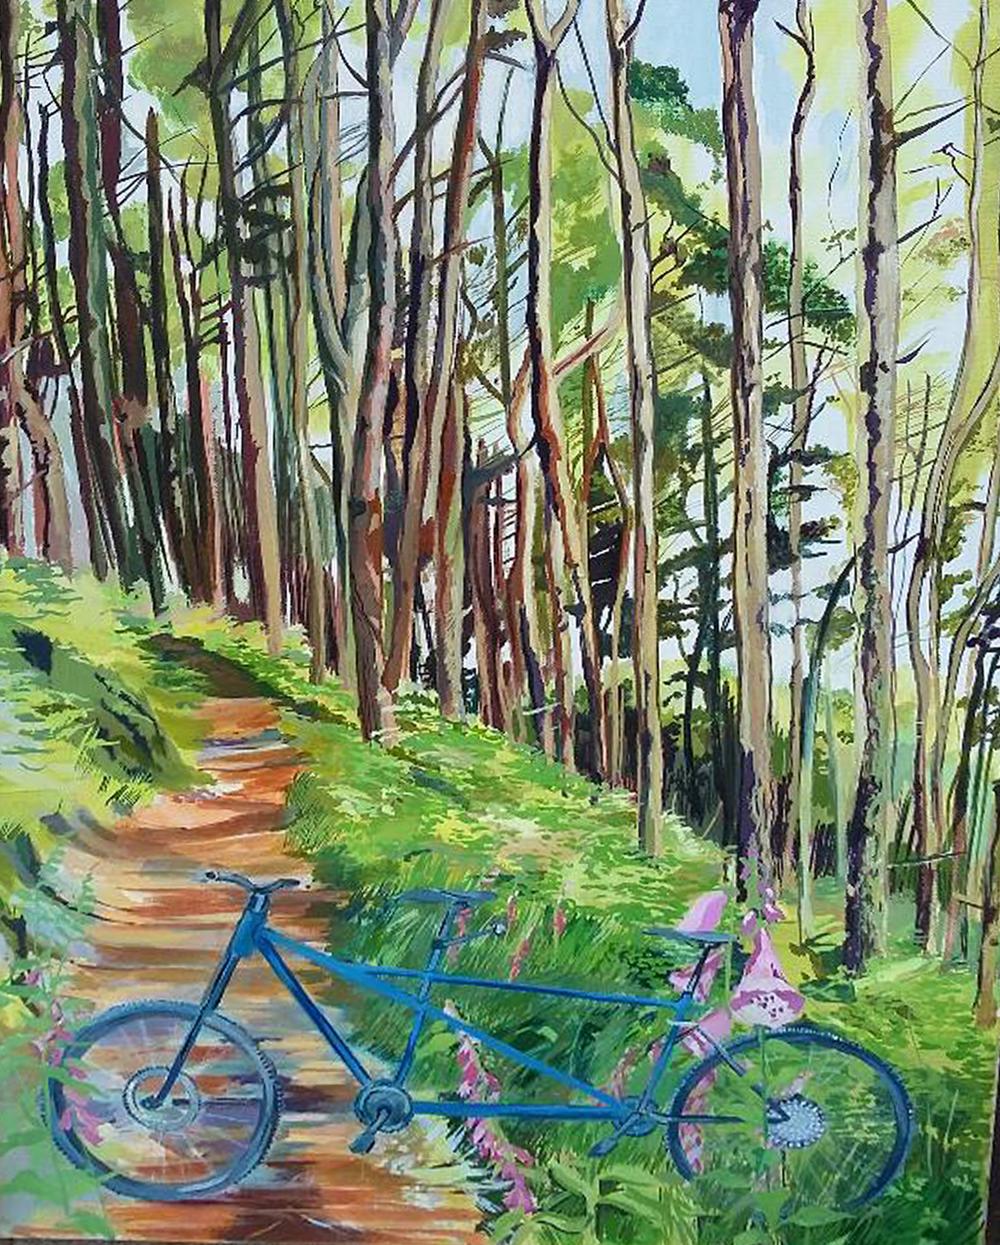 Tandem mountain bike in Welsh wood